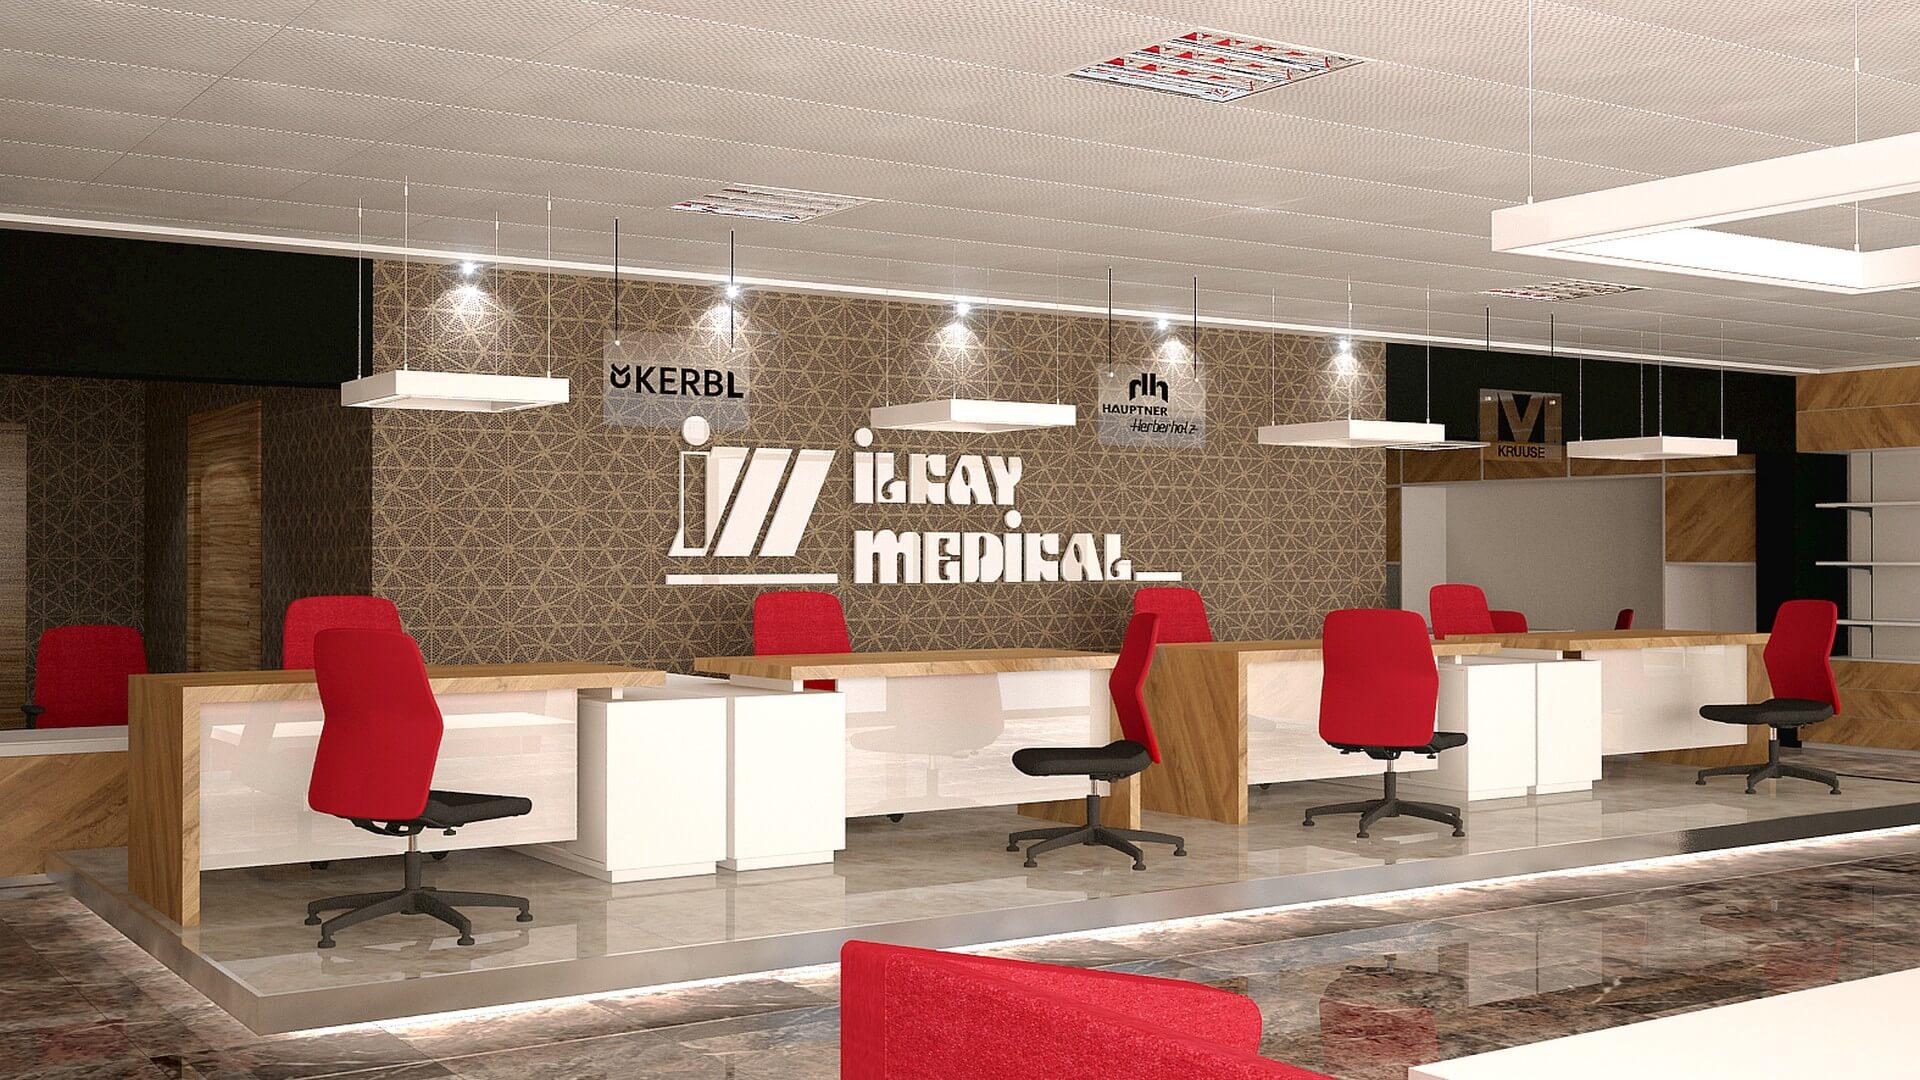 Retail Shop Design Interior Architecture Ilkay Medical Shop